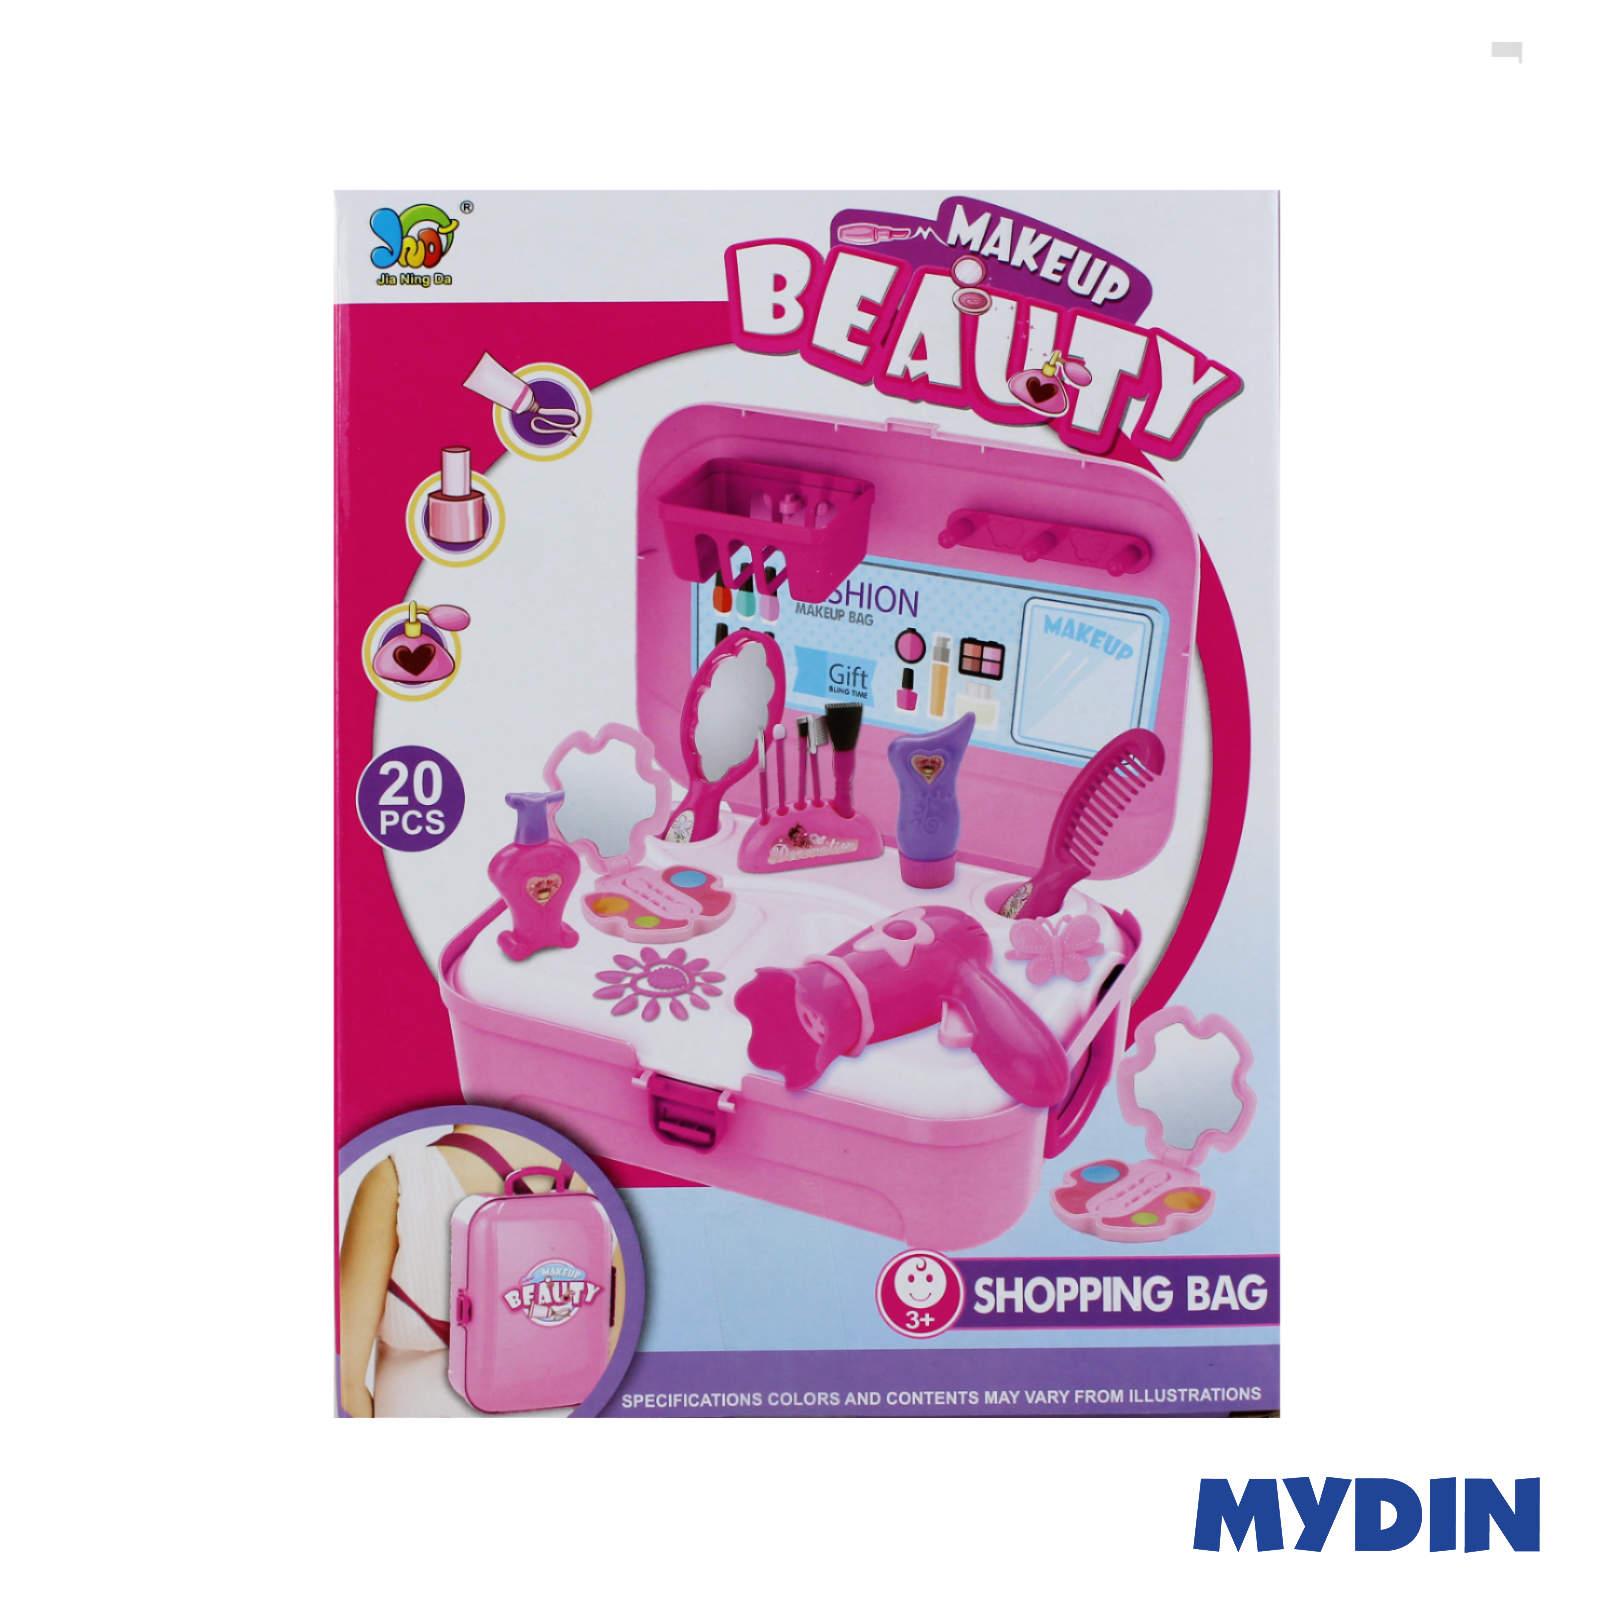 Make Up Beauty Bag (3years+) 118-74C-1725